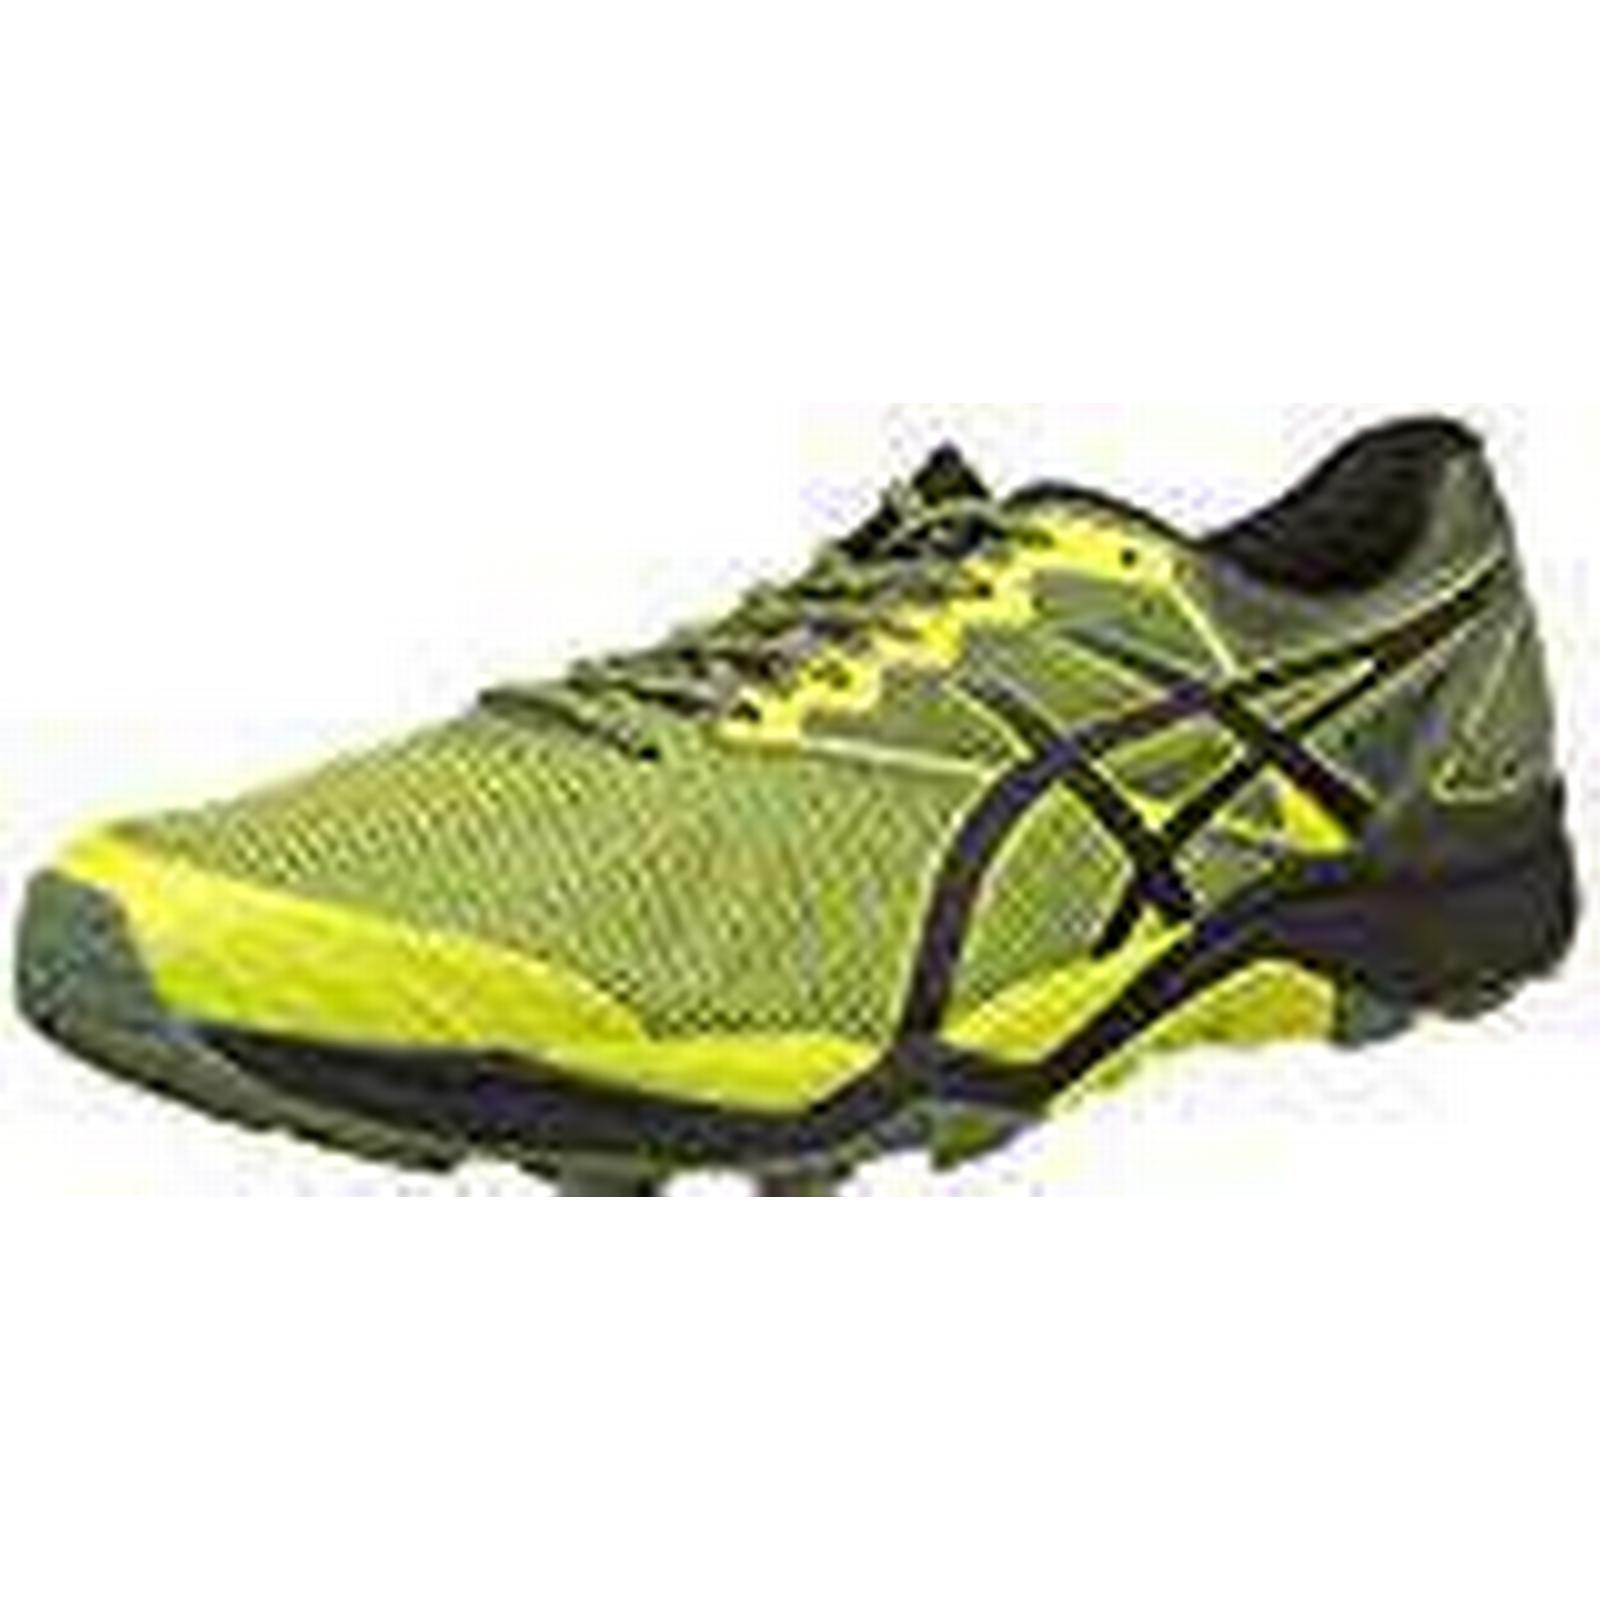 Asics Men's Gel-Fujitrabuco 6 Trail Running Shoes, Yellow (Sulphur Spring/Black/Four UK Leaf Clover 8990), 7.5 UK Spring/Black/Four (42 EU) 078fa0